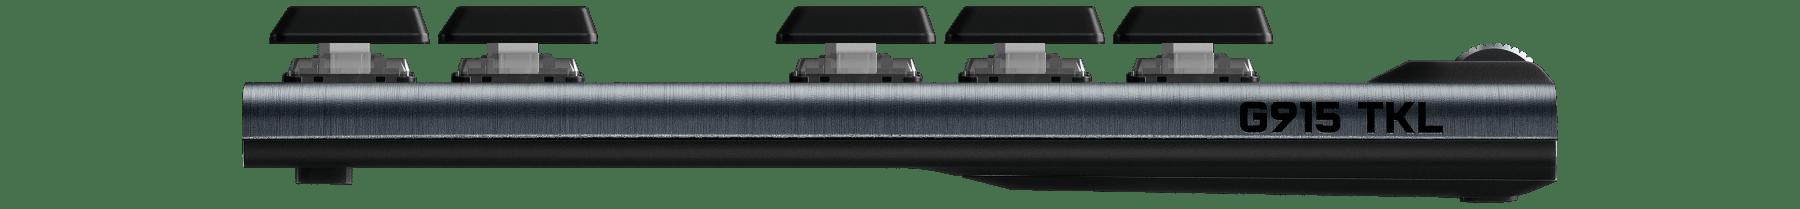 G915 | Prvotřídní materiál